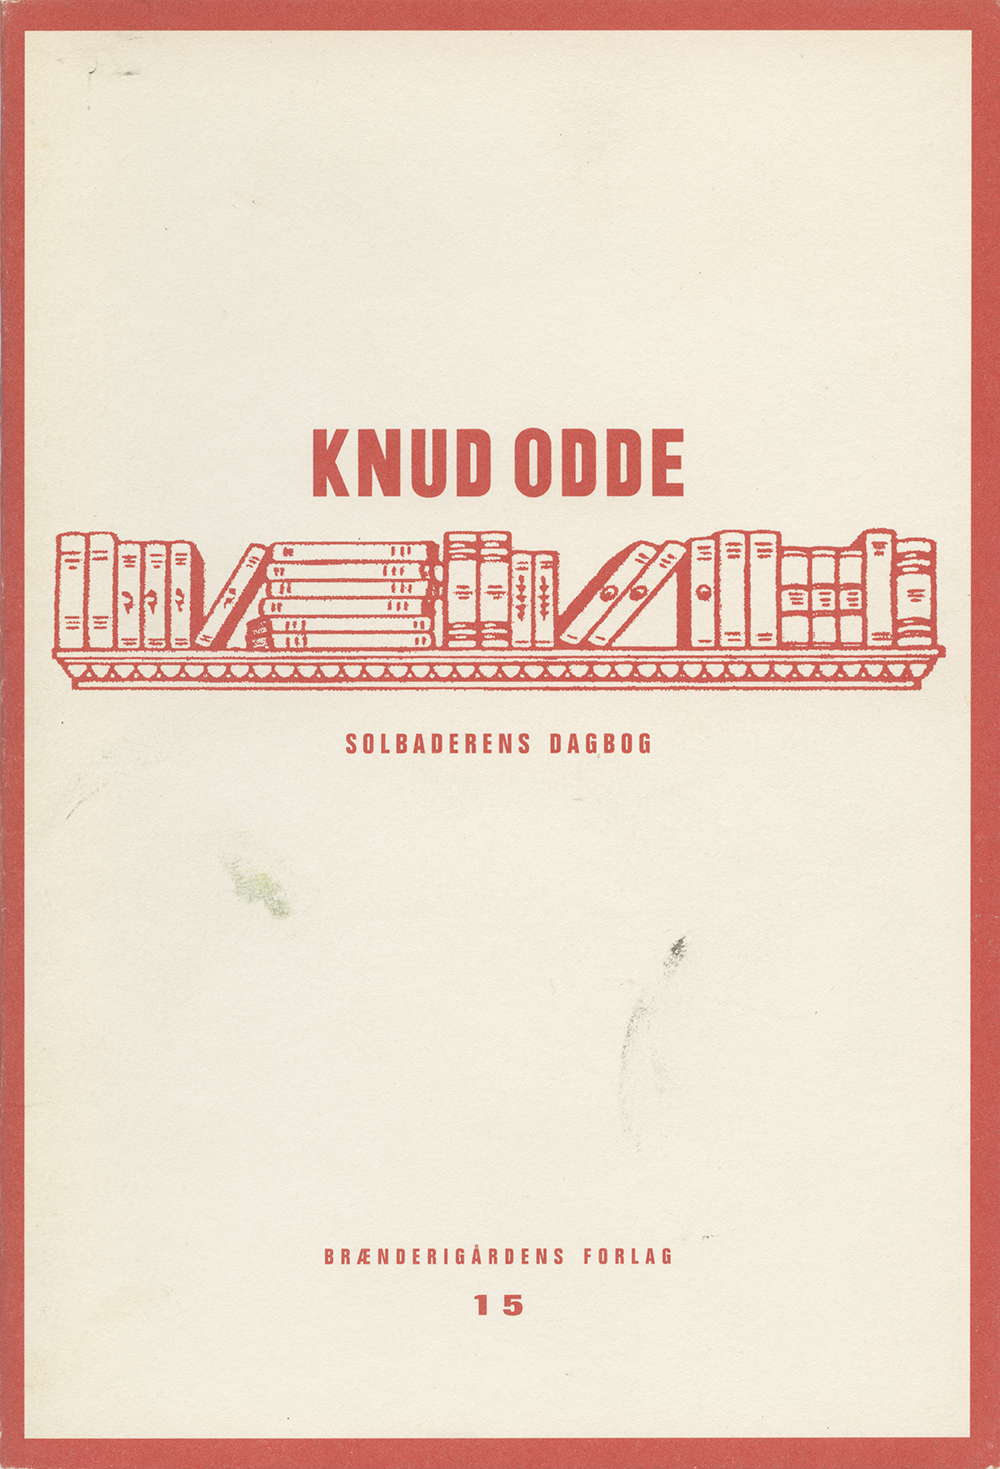 Knud Odde, solbadernes dagbog